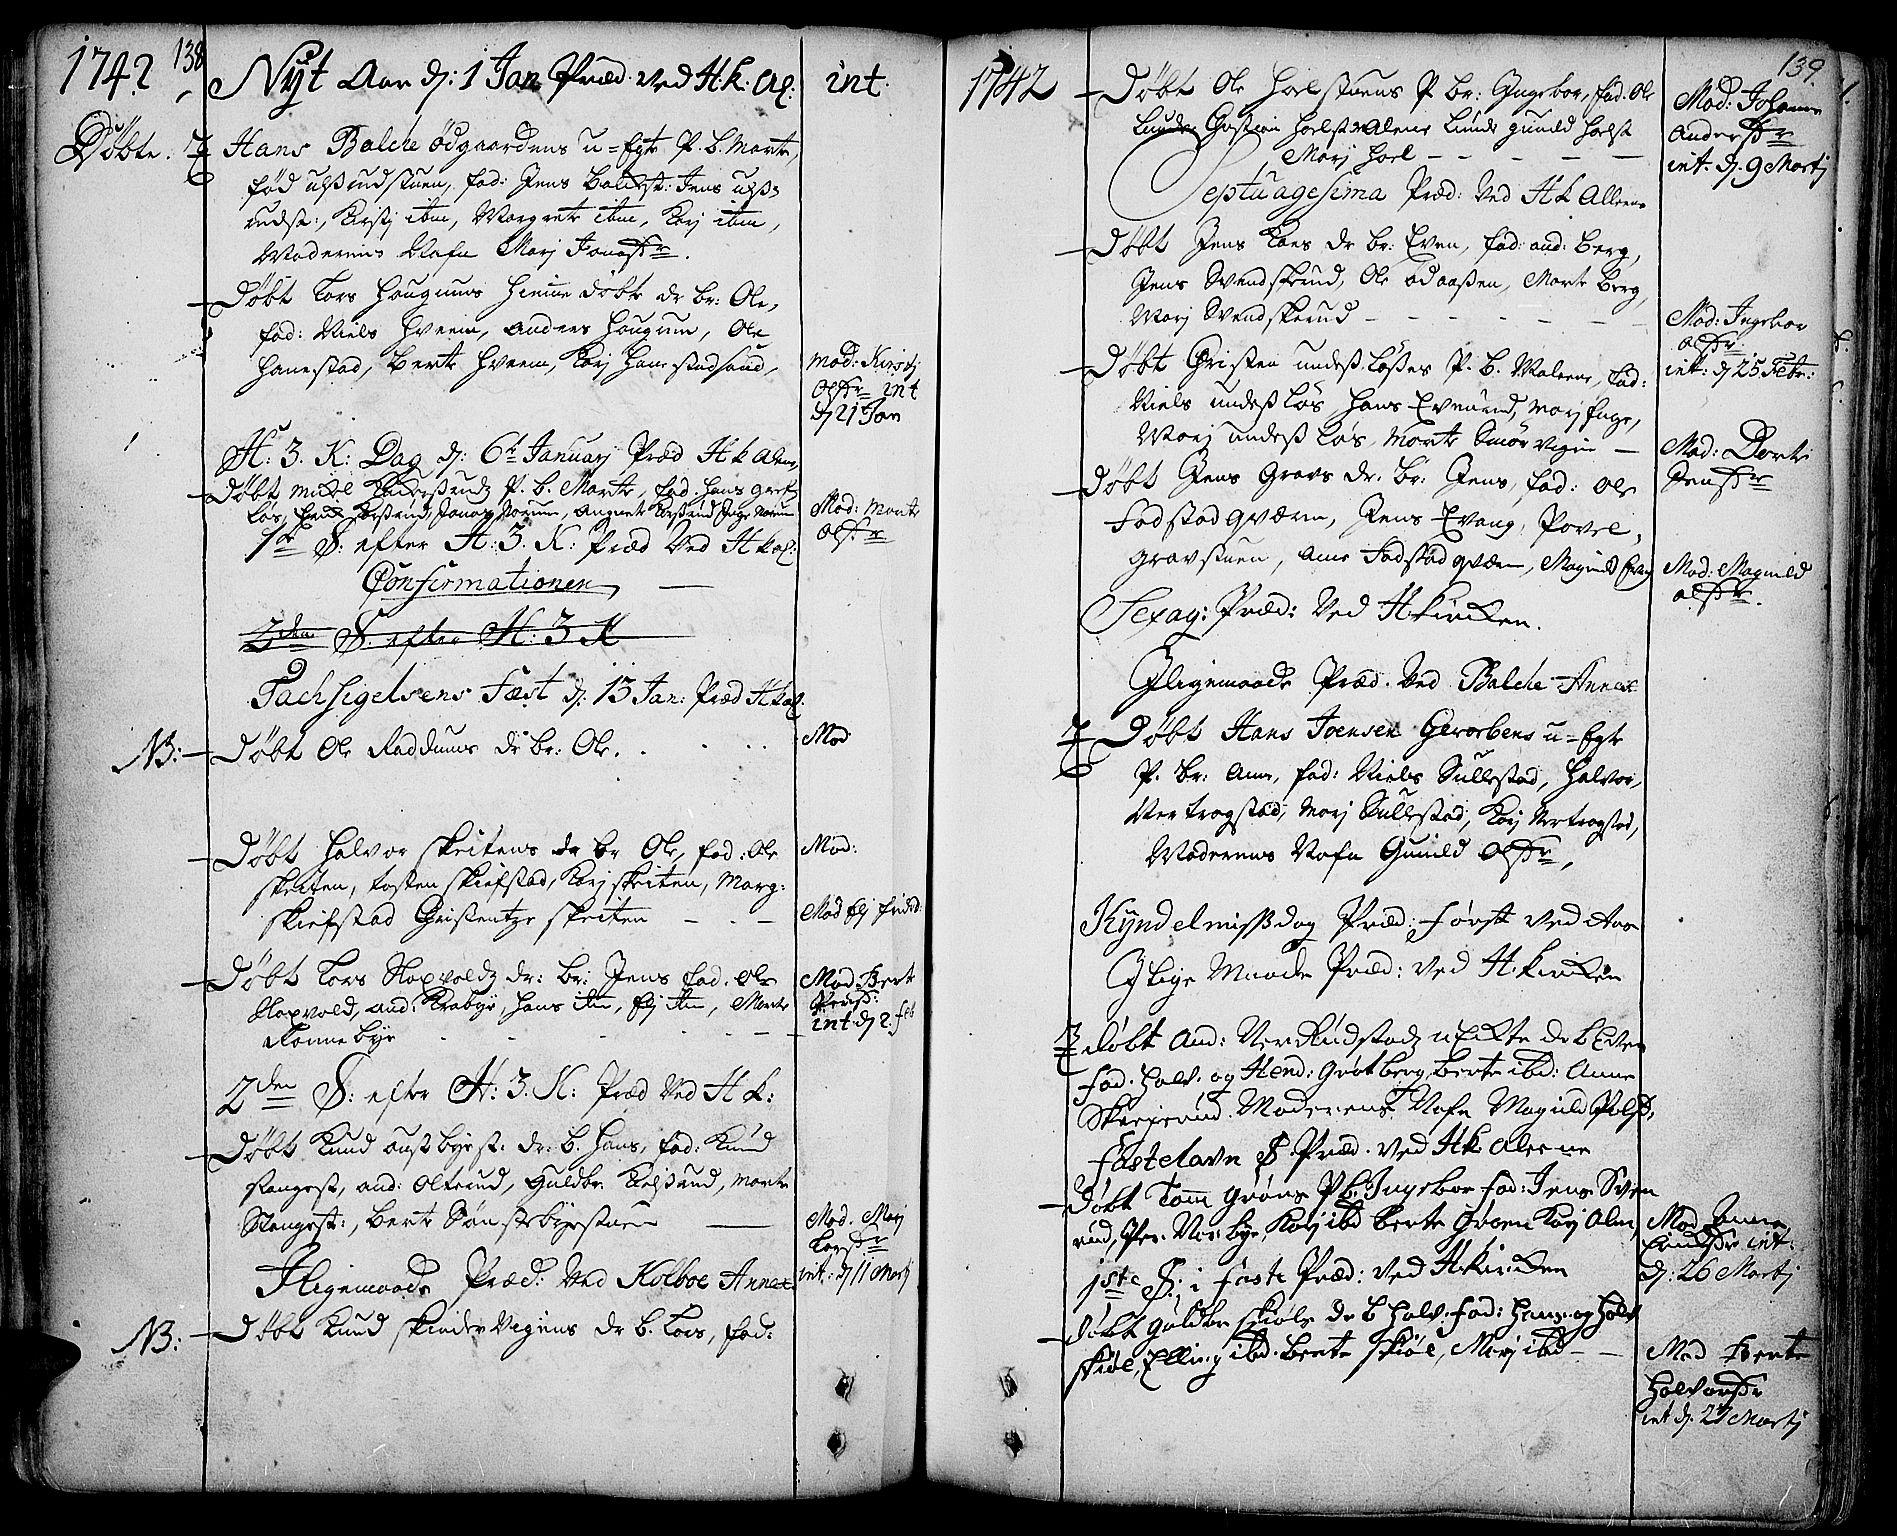 SAH, Toten prestekontor, Ministerialbok nr. 3, 1734-1751, s. 138-139